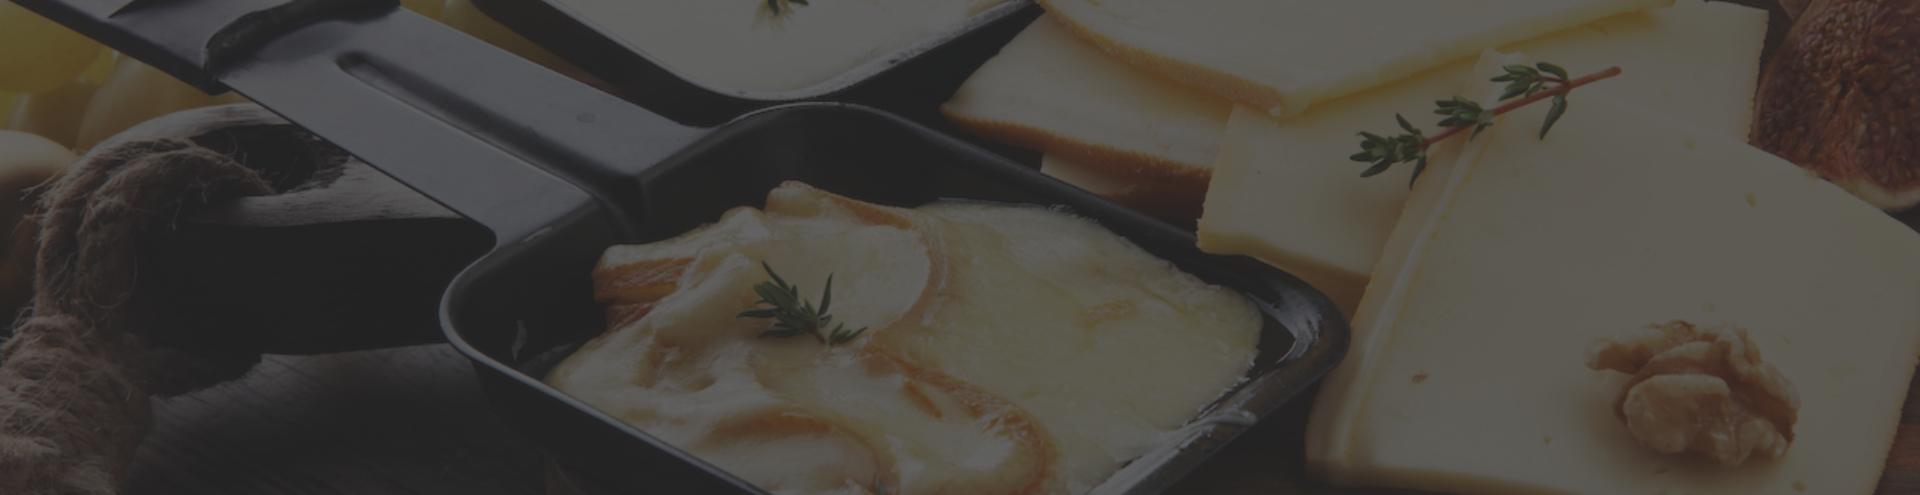 raclette fondue bandeau